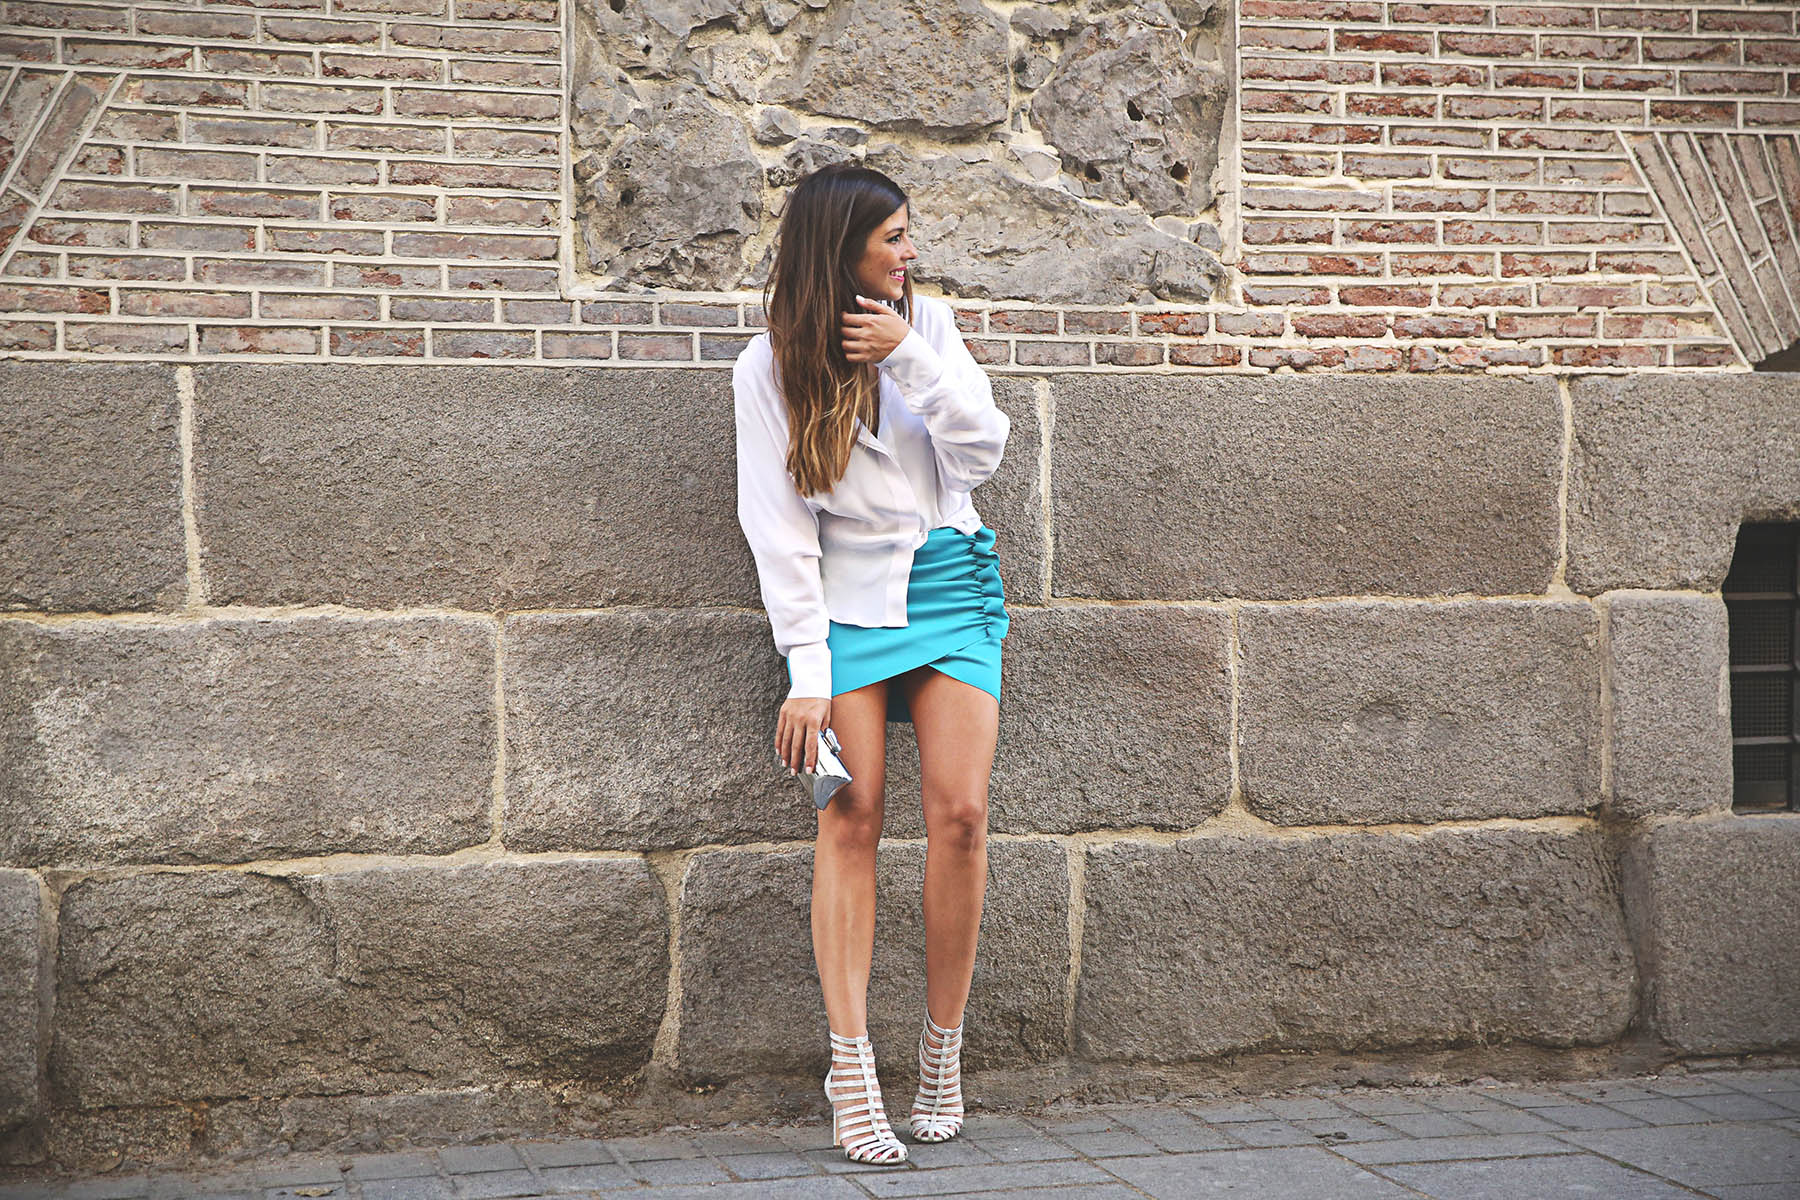 trendy-taste-look-outfit-street-style-ootd-blog-blogger-fashion-spain-moda-españa-lolali-blue-neopreno-azul-falda-blusa-bcbg-338-sandalias-serpiente-6